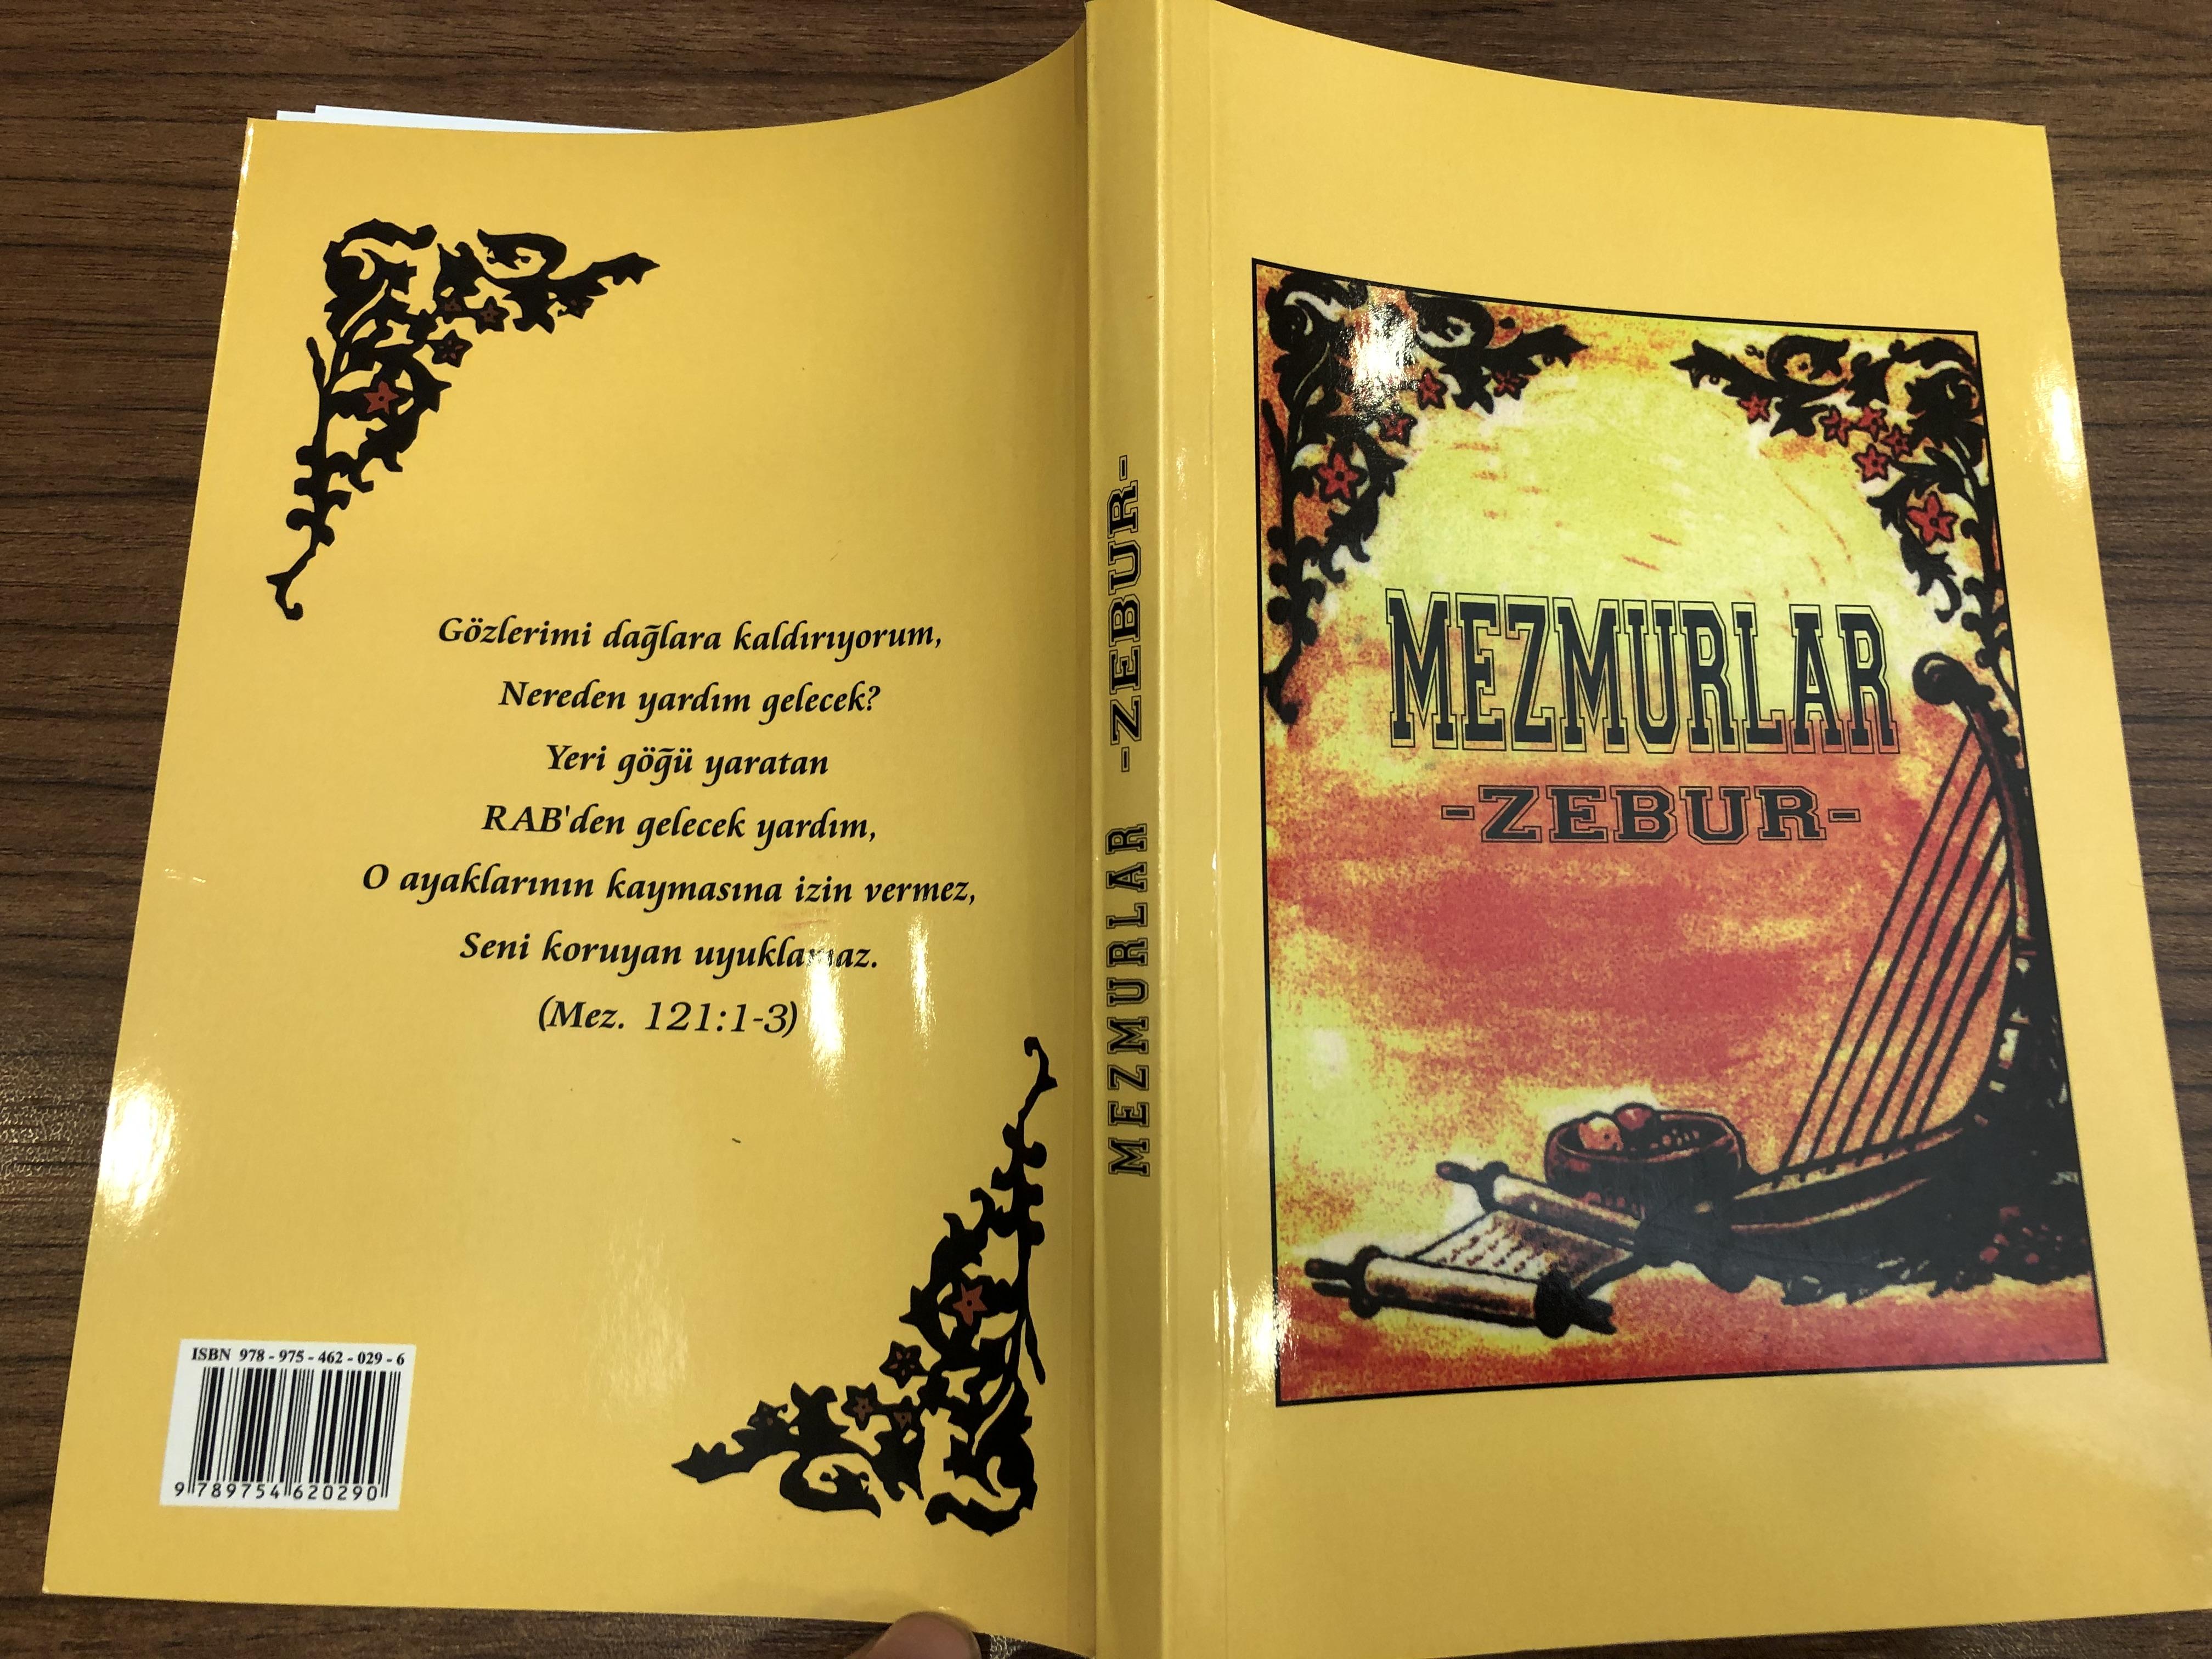 mezmurlar-zebur-zabur-psalms-in-turkish-new-translation-from-the-original-hebrew-language-kitabi-mukaddes-sirketi-paperback-2011-10-.jpg